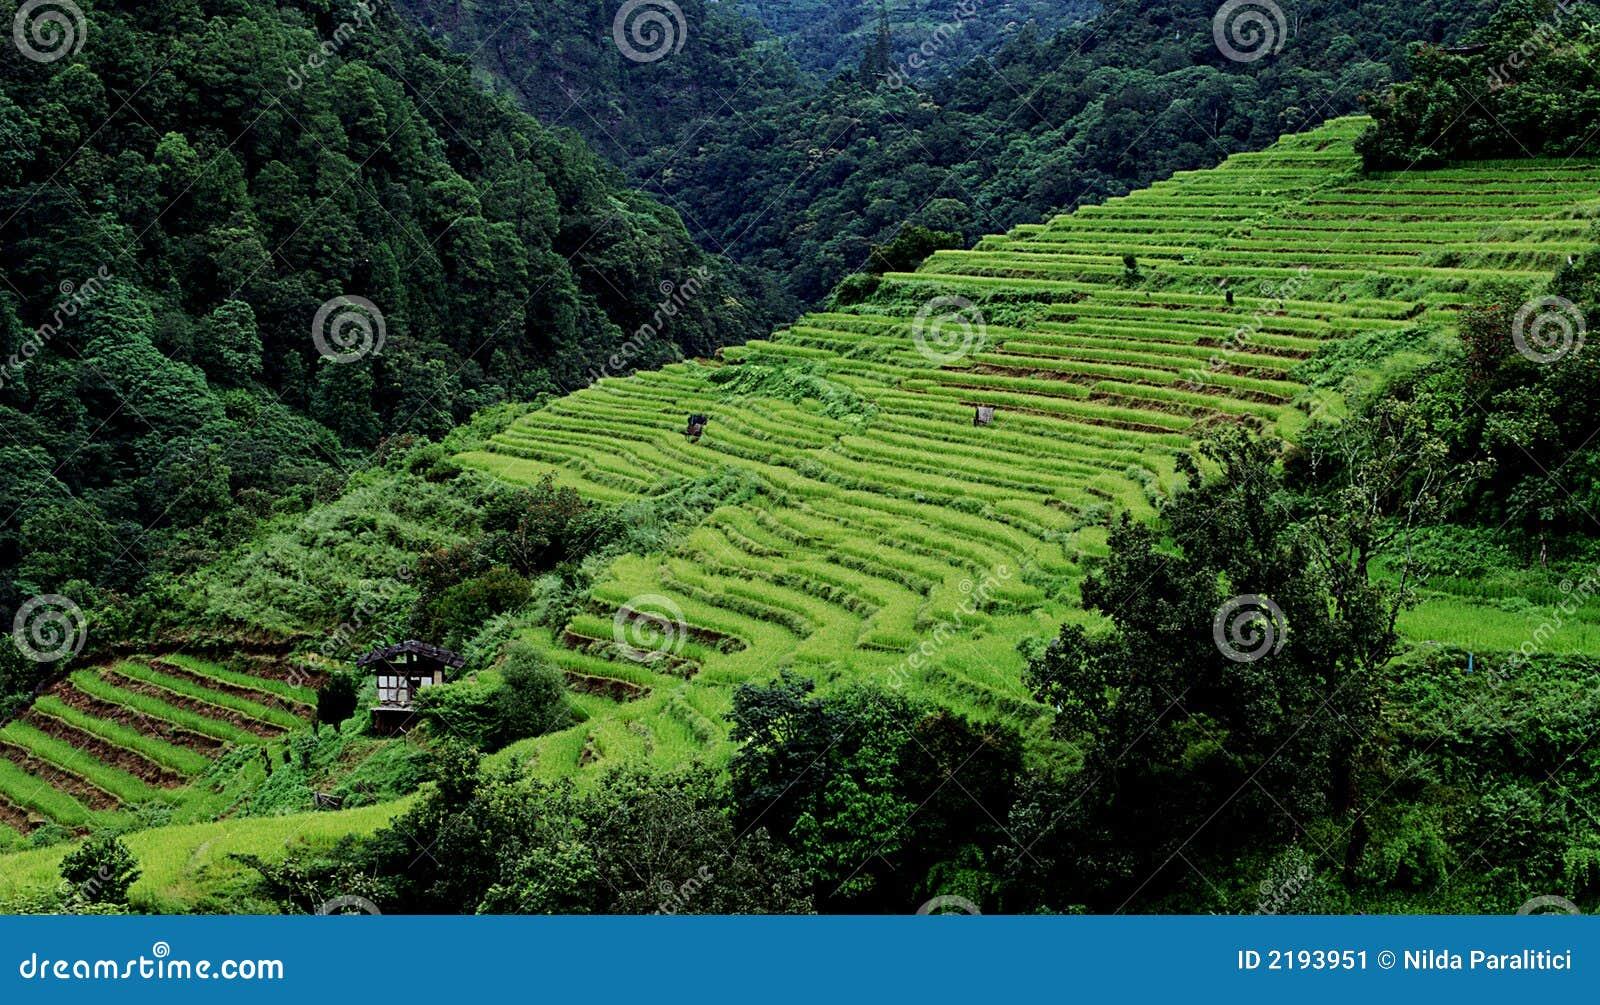 терраса риса